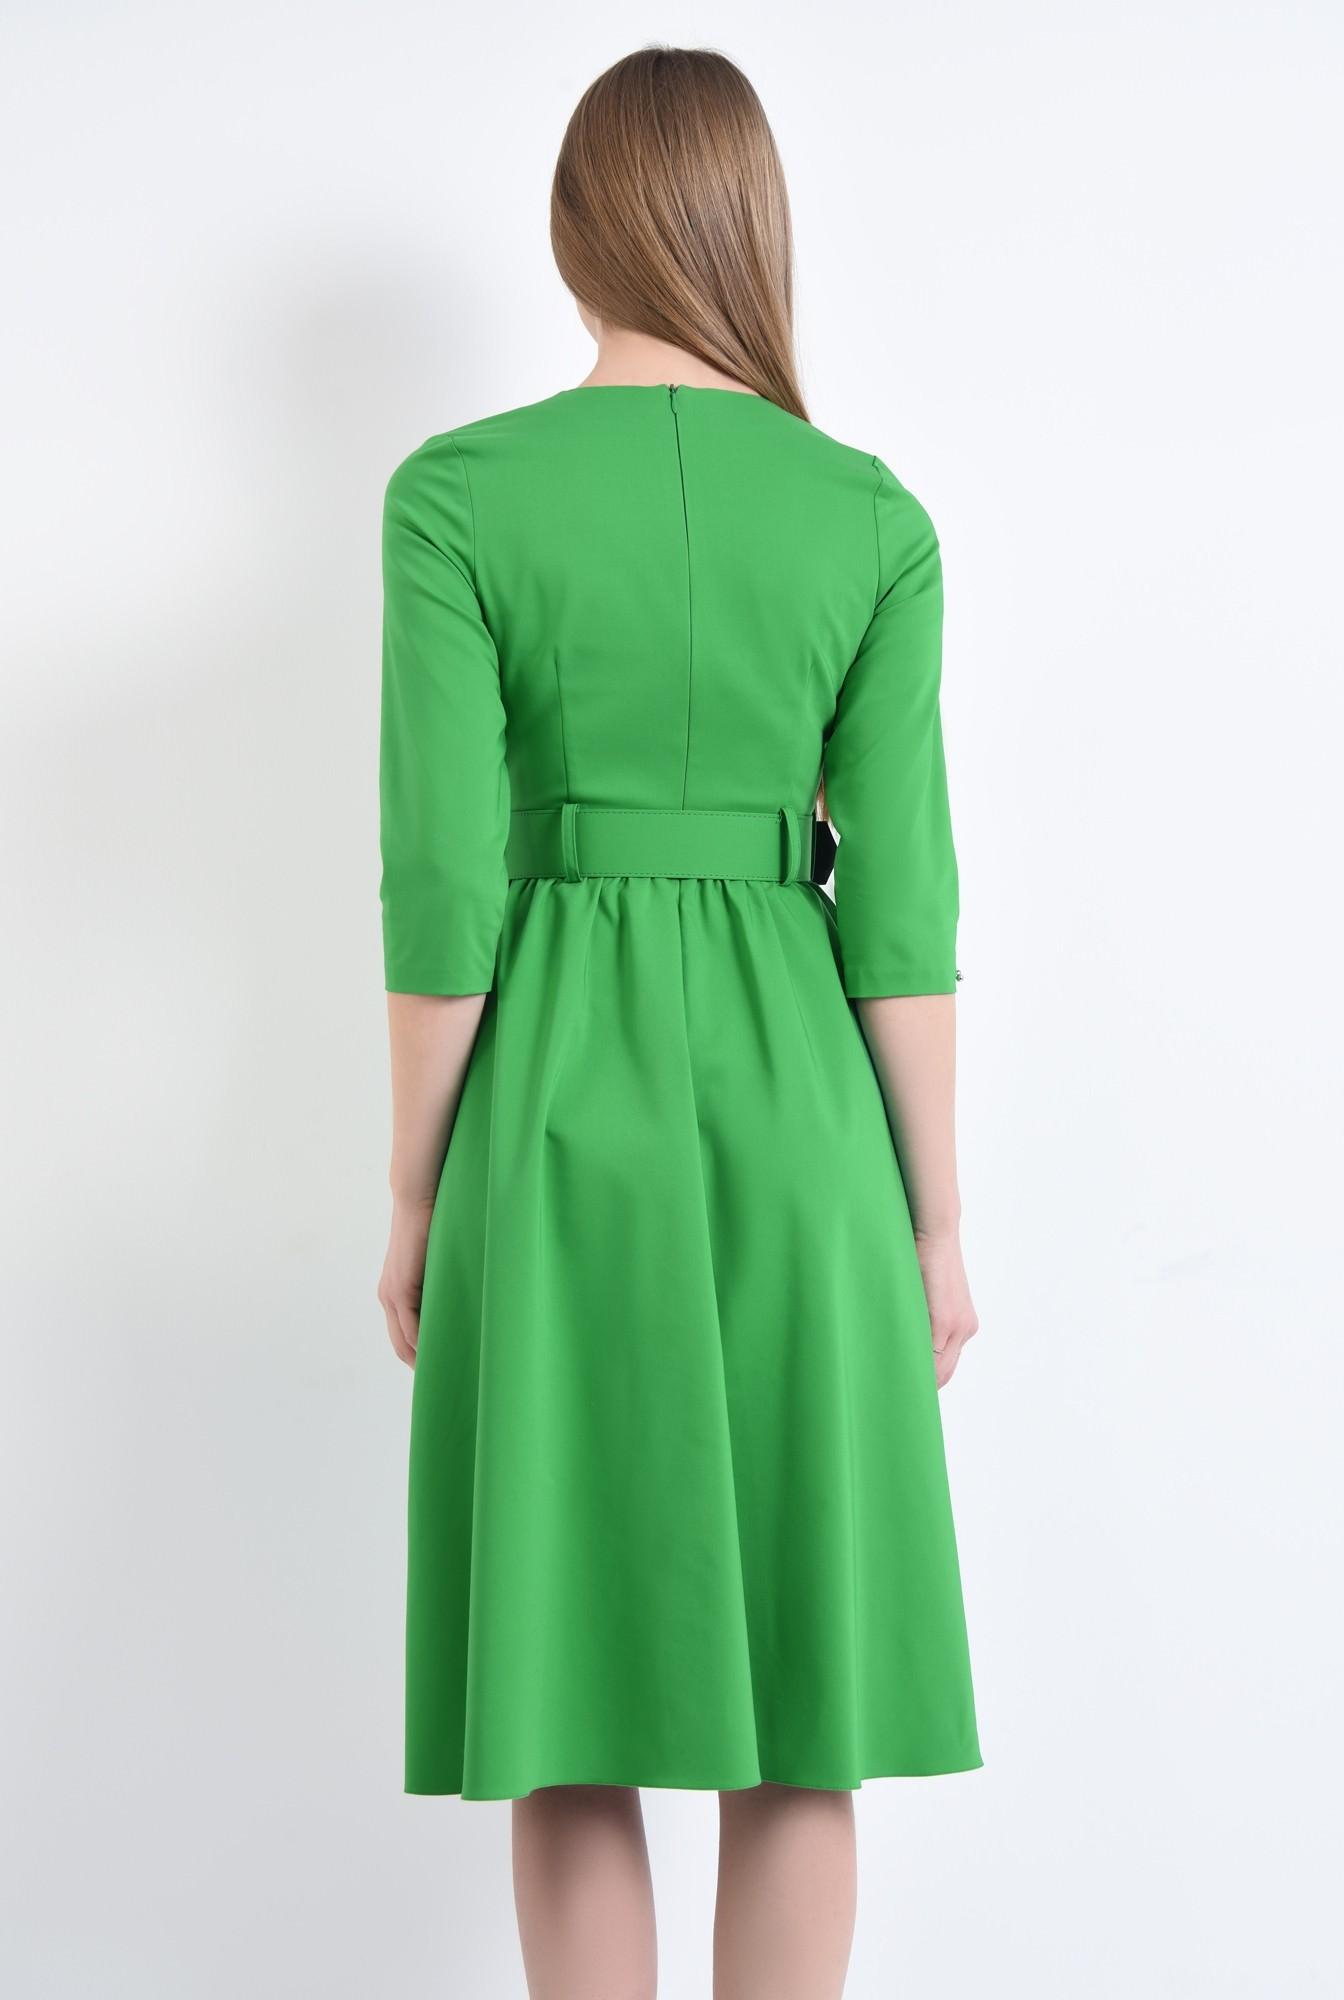 1 - Rochie casual, verde